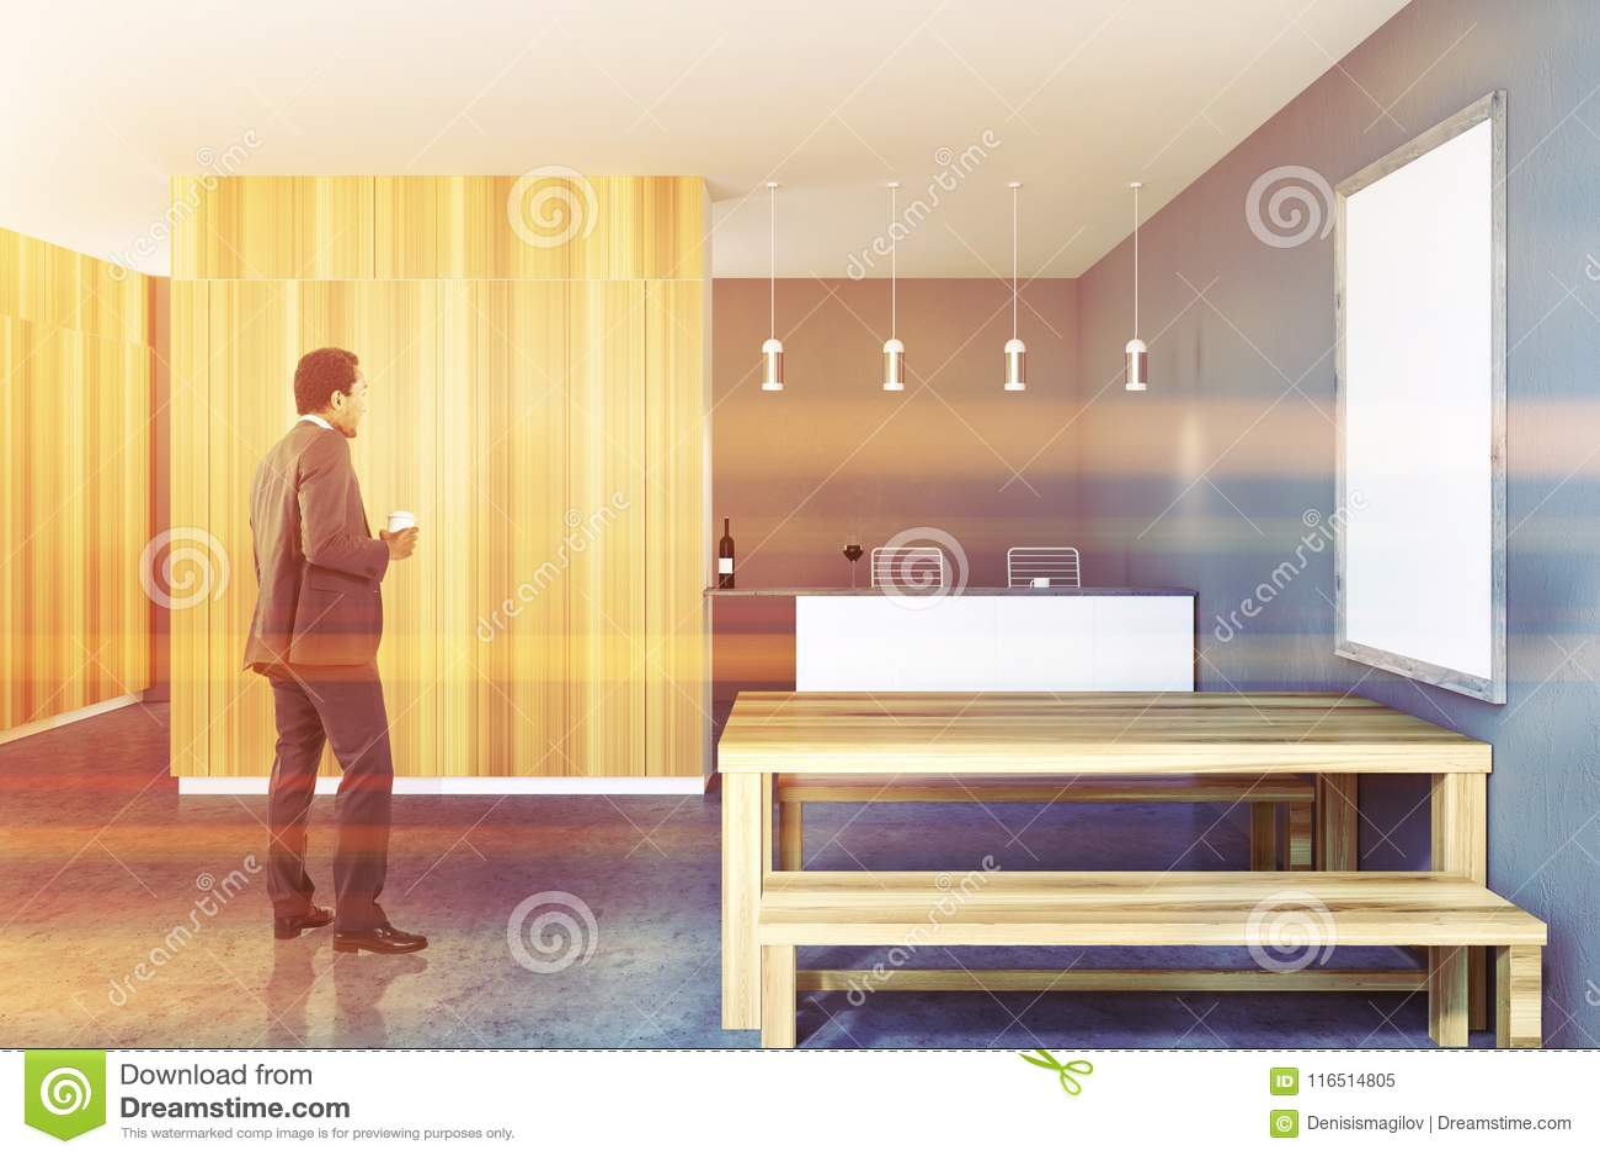 Rustic Kitchen Interior, Frame Poster, Businessman Stock Image ...